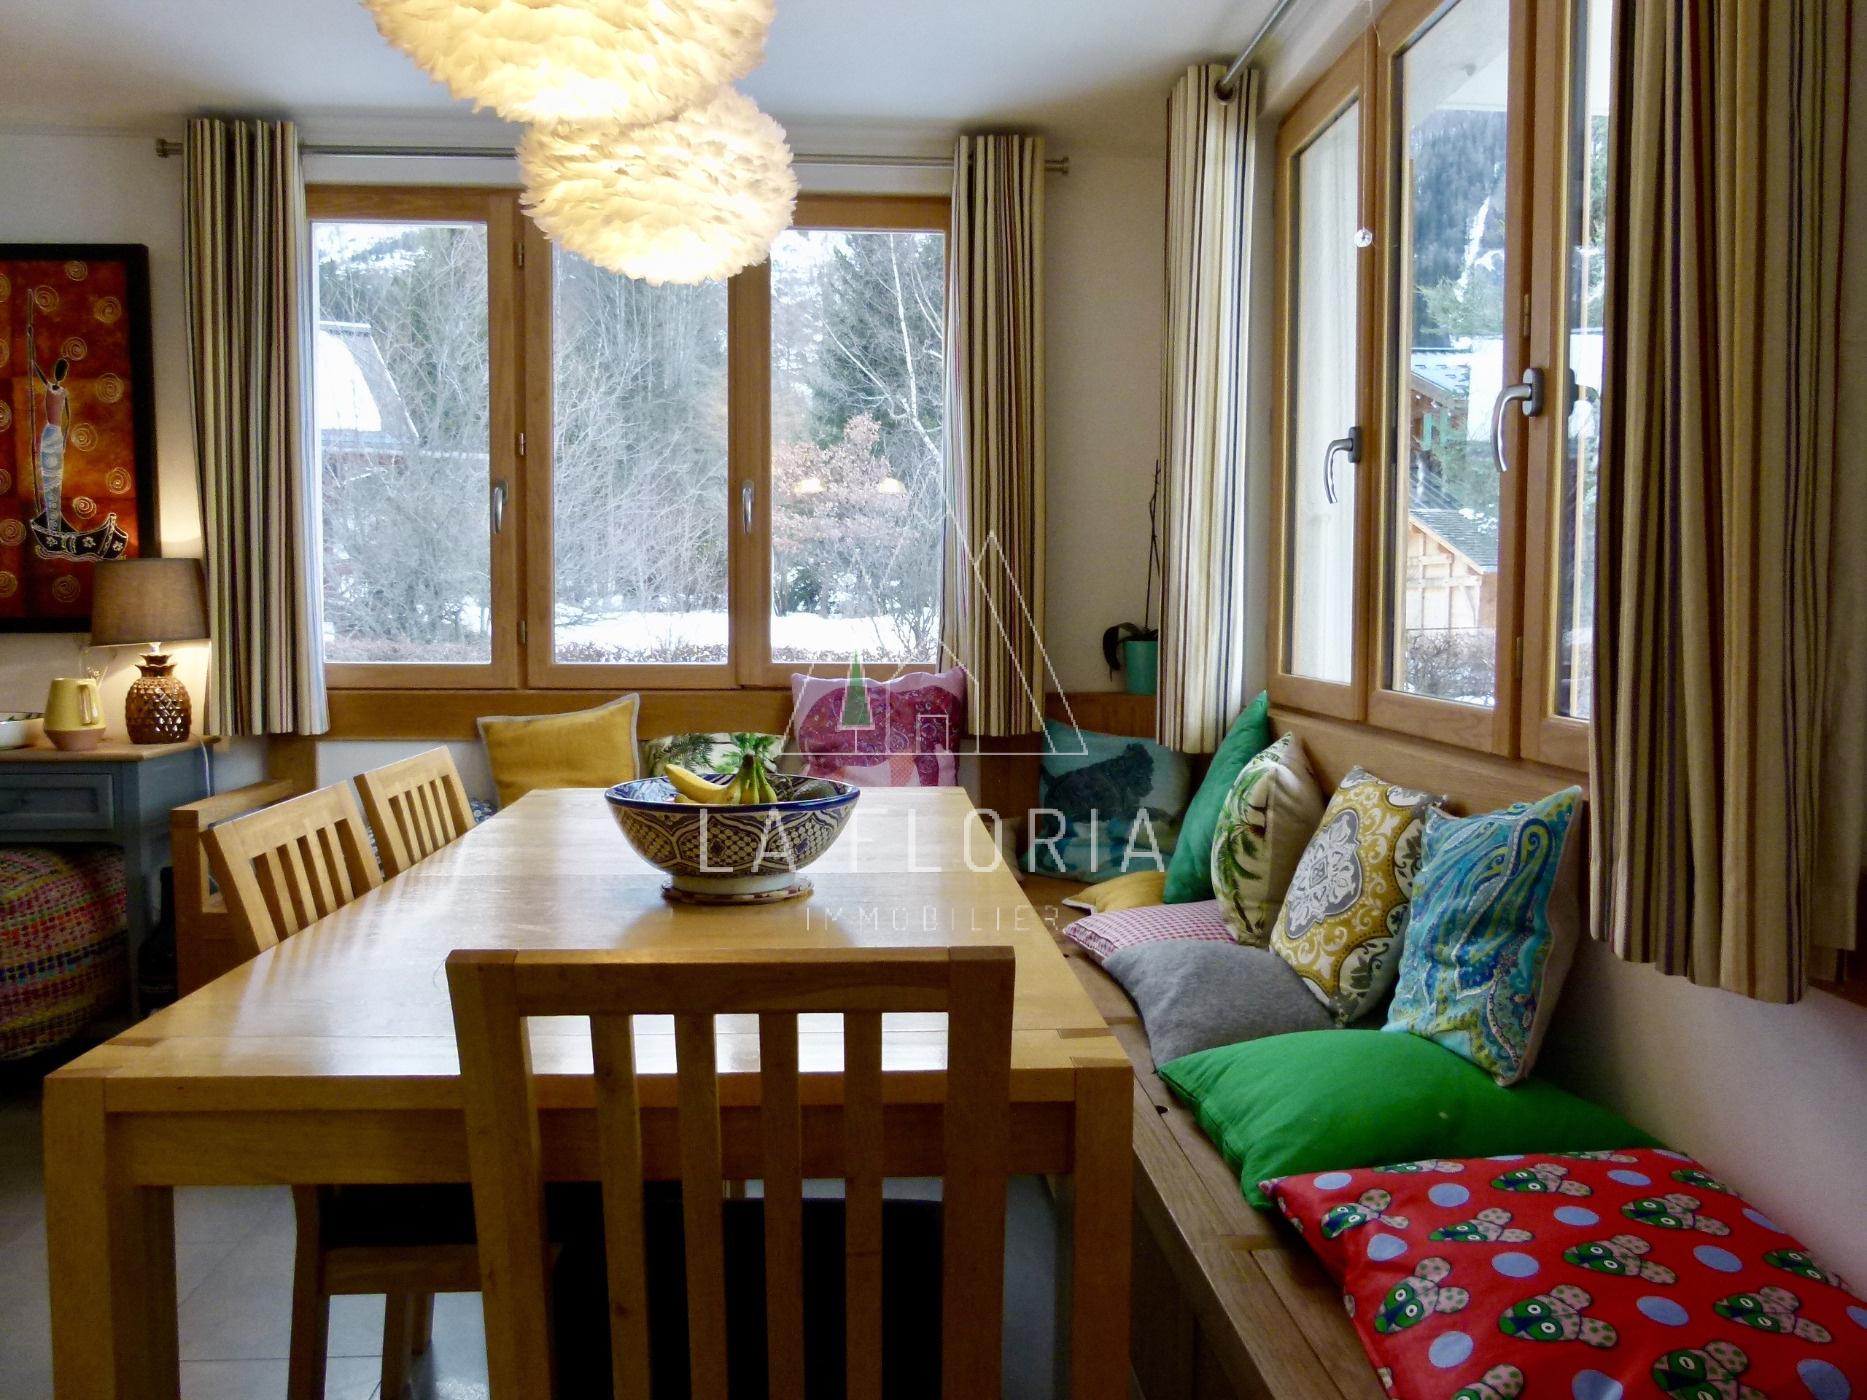 5 BEDROOM RENOVATED CHALET LES BOIS CHAMONIX